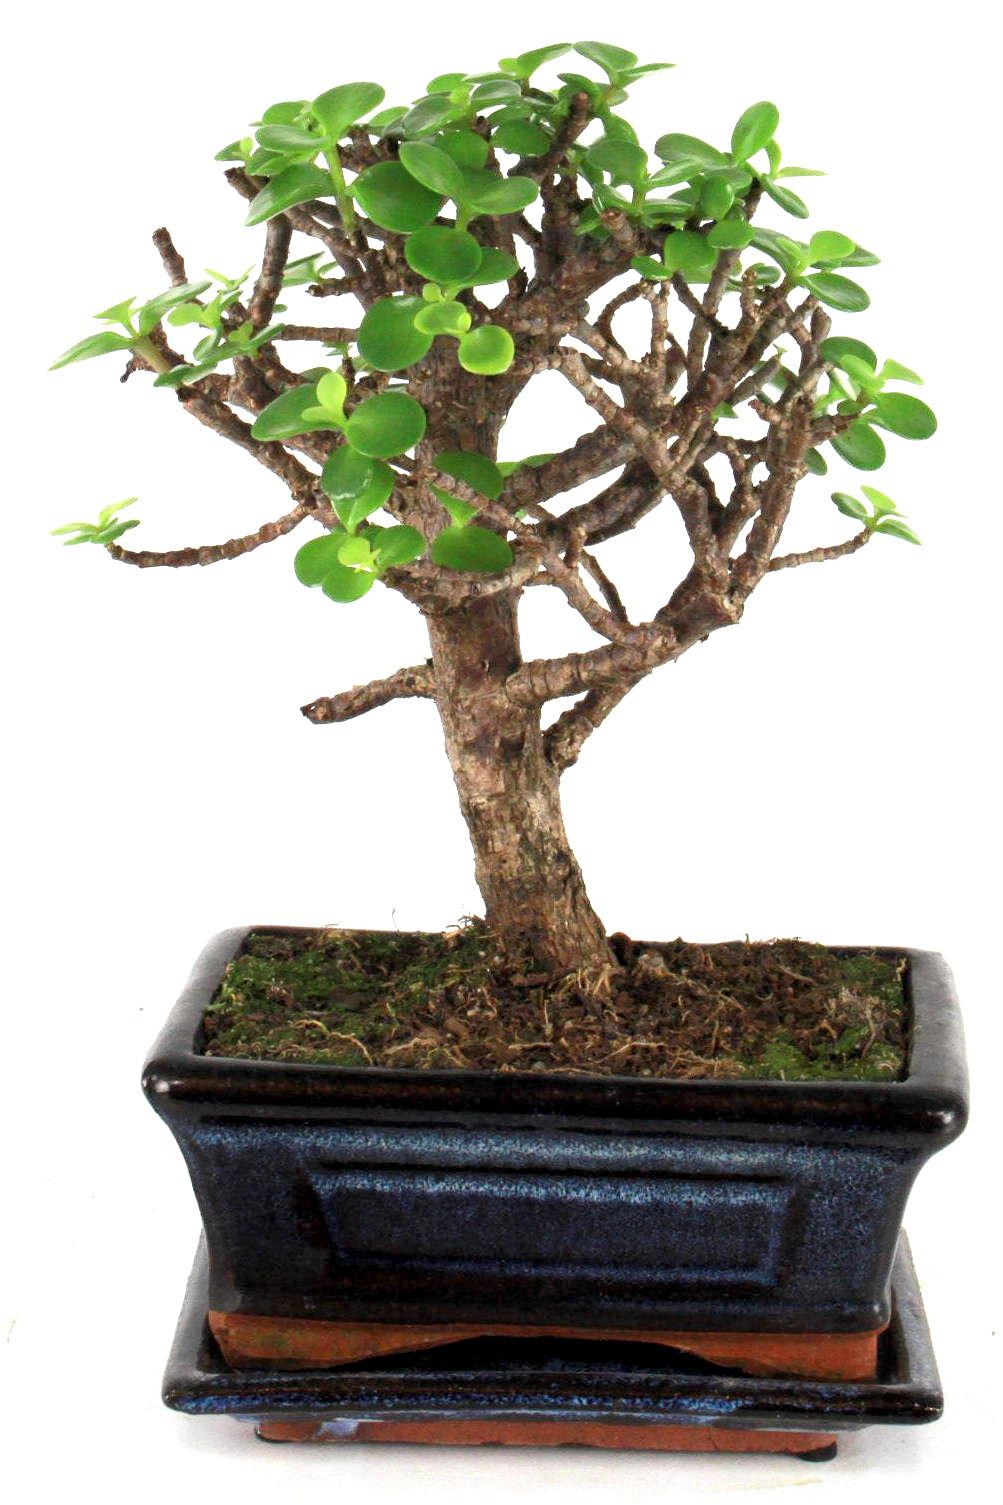 dickblatt 25 cm b165 bei oyaki bonsai kaufen. Black Bedroom Furniture Sets. Home Design Ideas